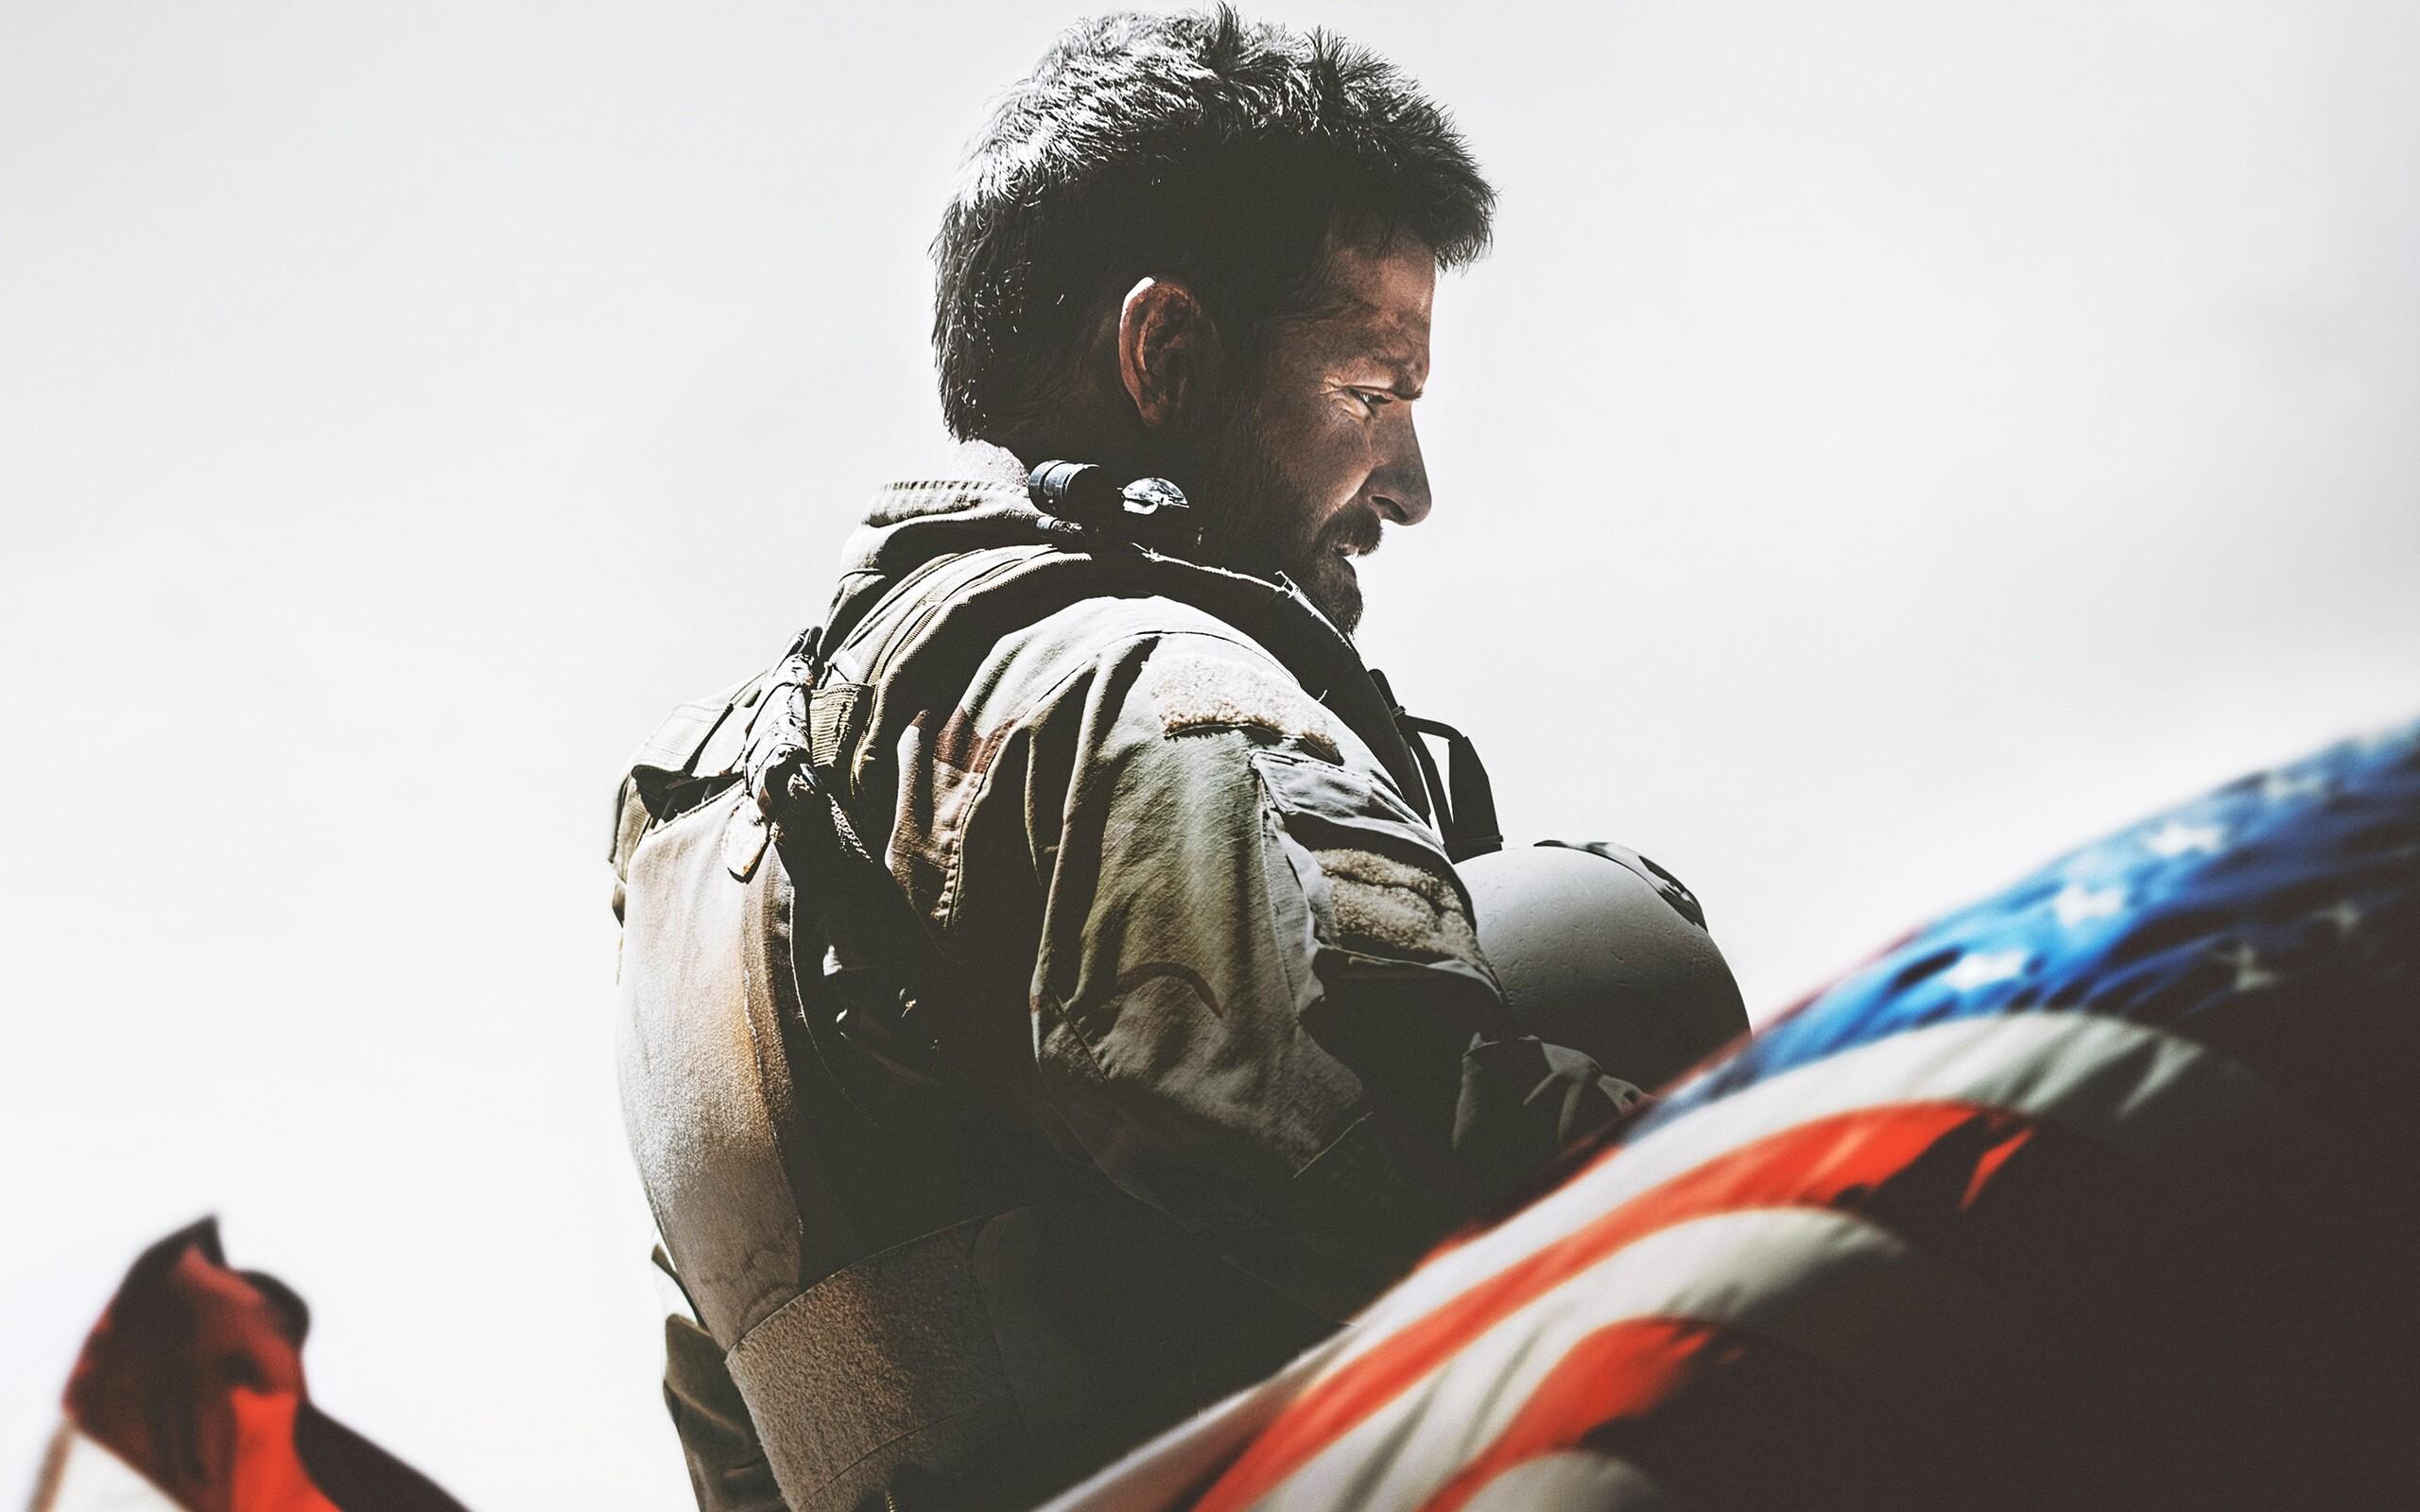 2560x1600 American Sniper Movie 2560x1600 Resolution Hd 4k